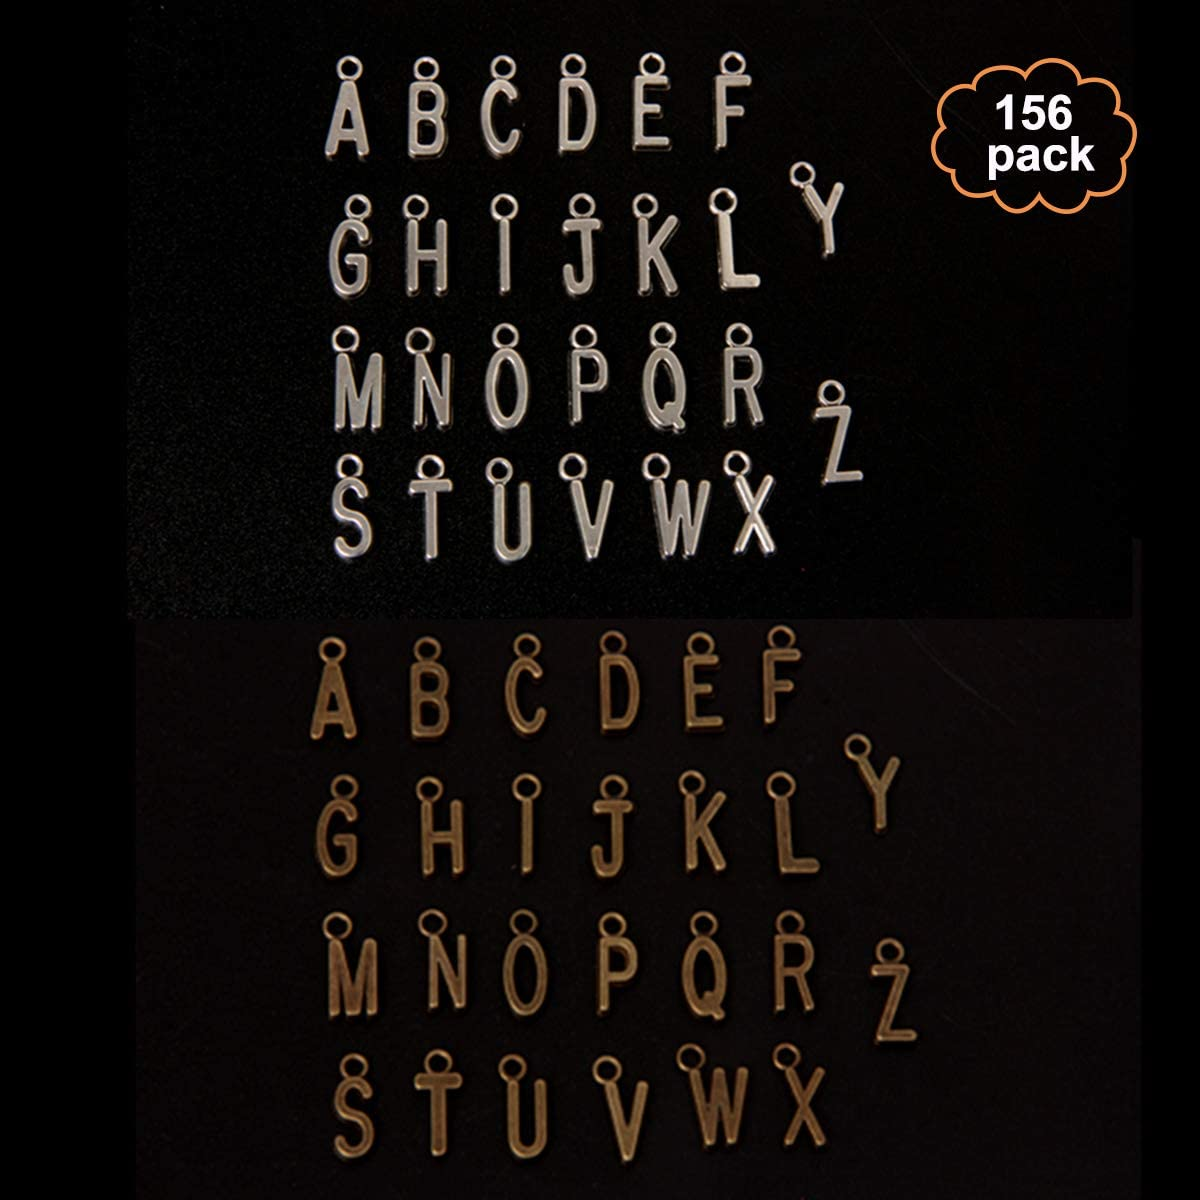 yalansmaiP 156pcs/6Set Alphabet A-Z Letter Charms Pendant Loose Beads Set Alphabetic Letter Pendants for Jewelry Making (3 Set Silver, 3 Set Bronze)